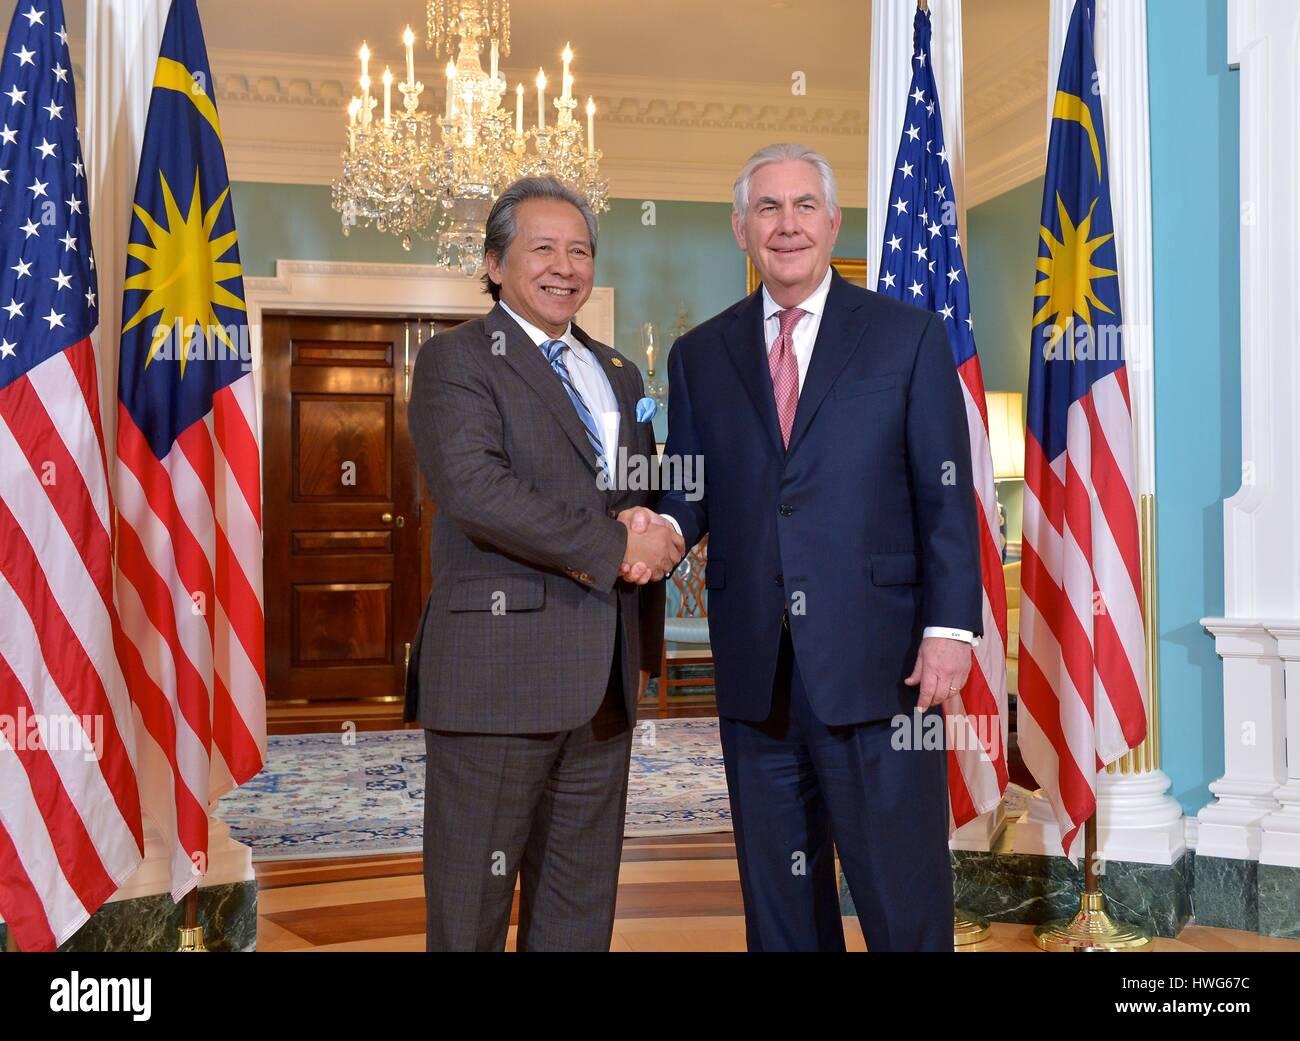 Washington, USA. 21st Mar, 2017. U.S. Secretary of State Rex Tillerson greets Malaysian Foreign Minister Dato Sri Stock Photo